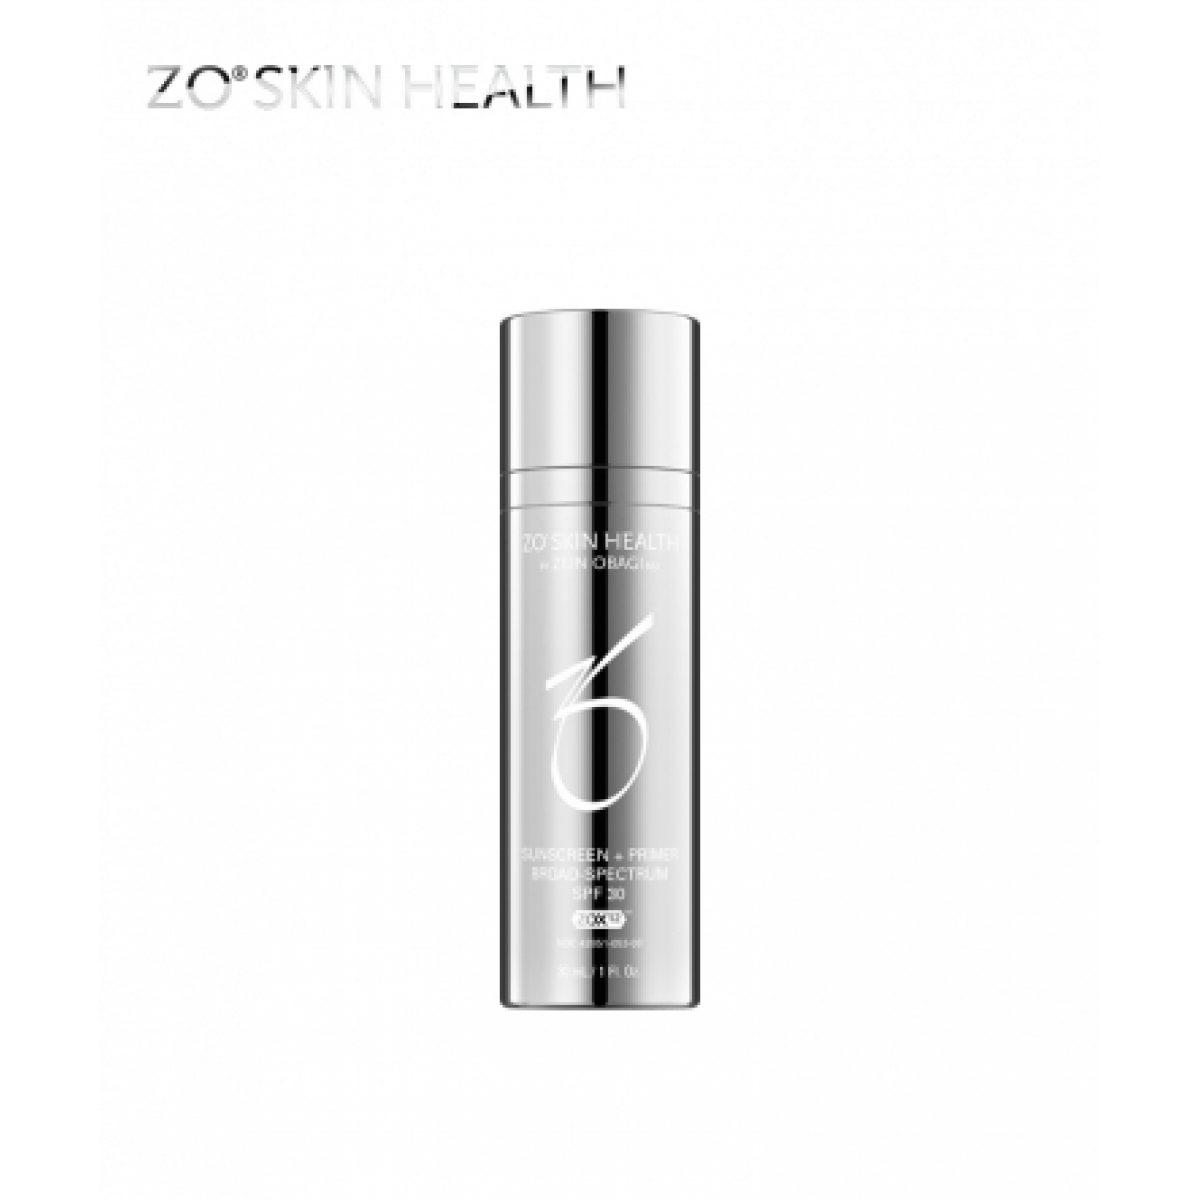 Oclipse® Sunscreen + Primer Broad SPF 30